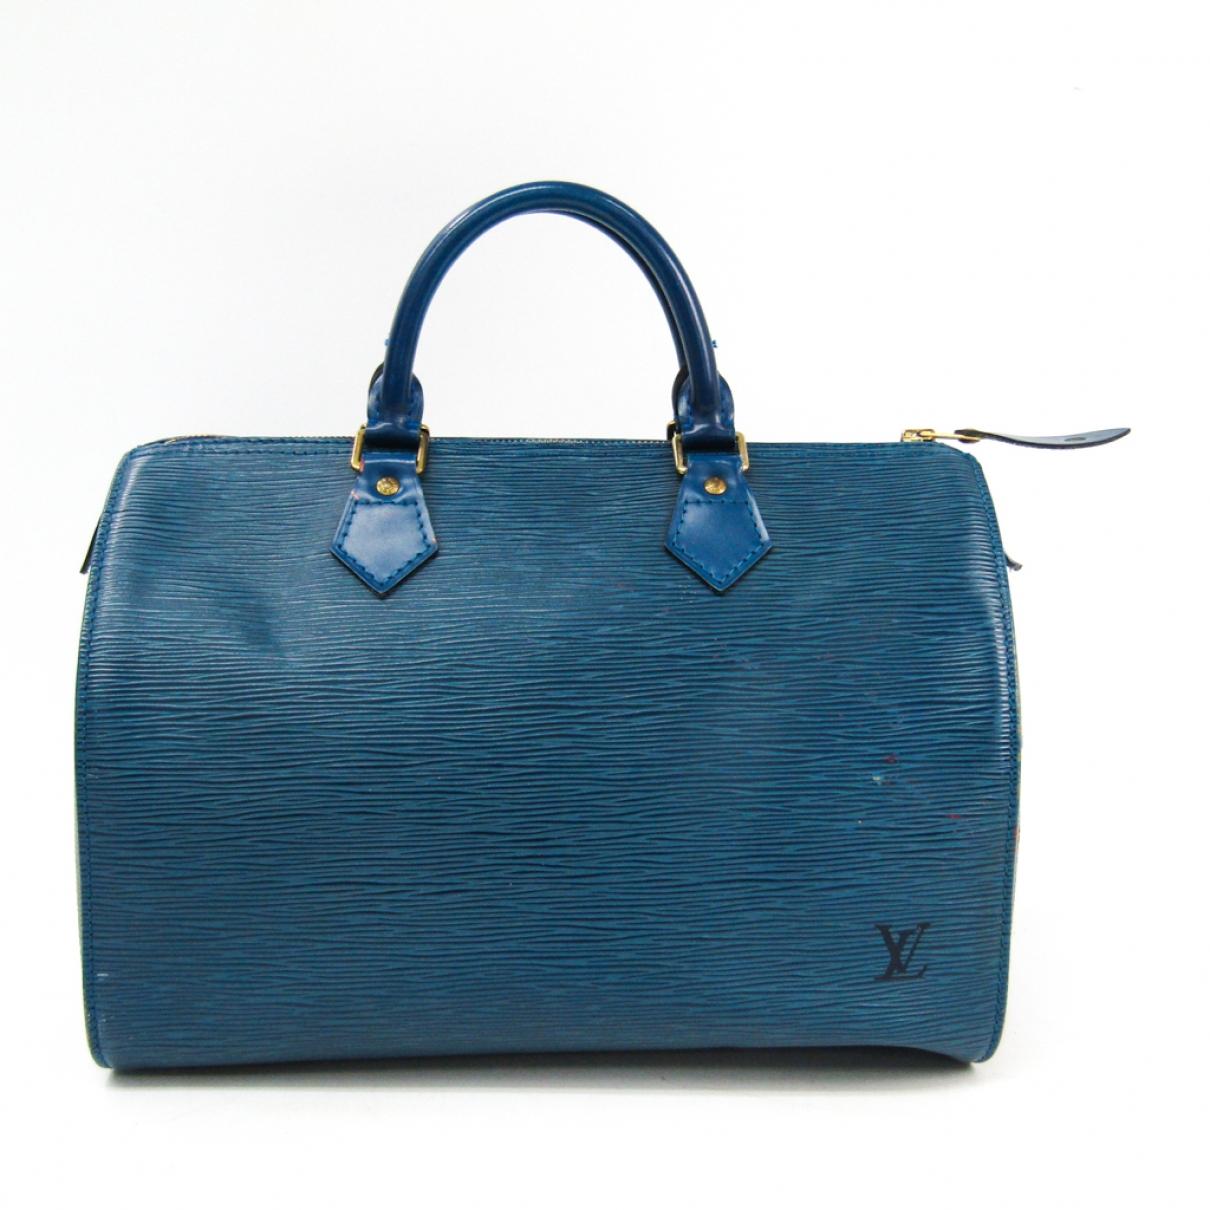 Louis Vuitton Speedy Blue Leather handbag for Women \N